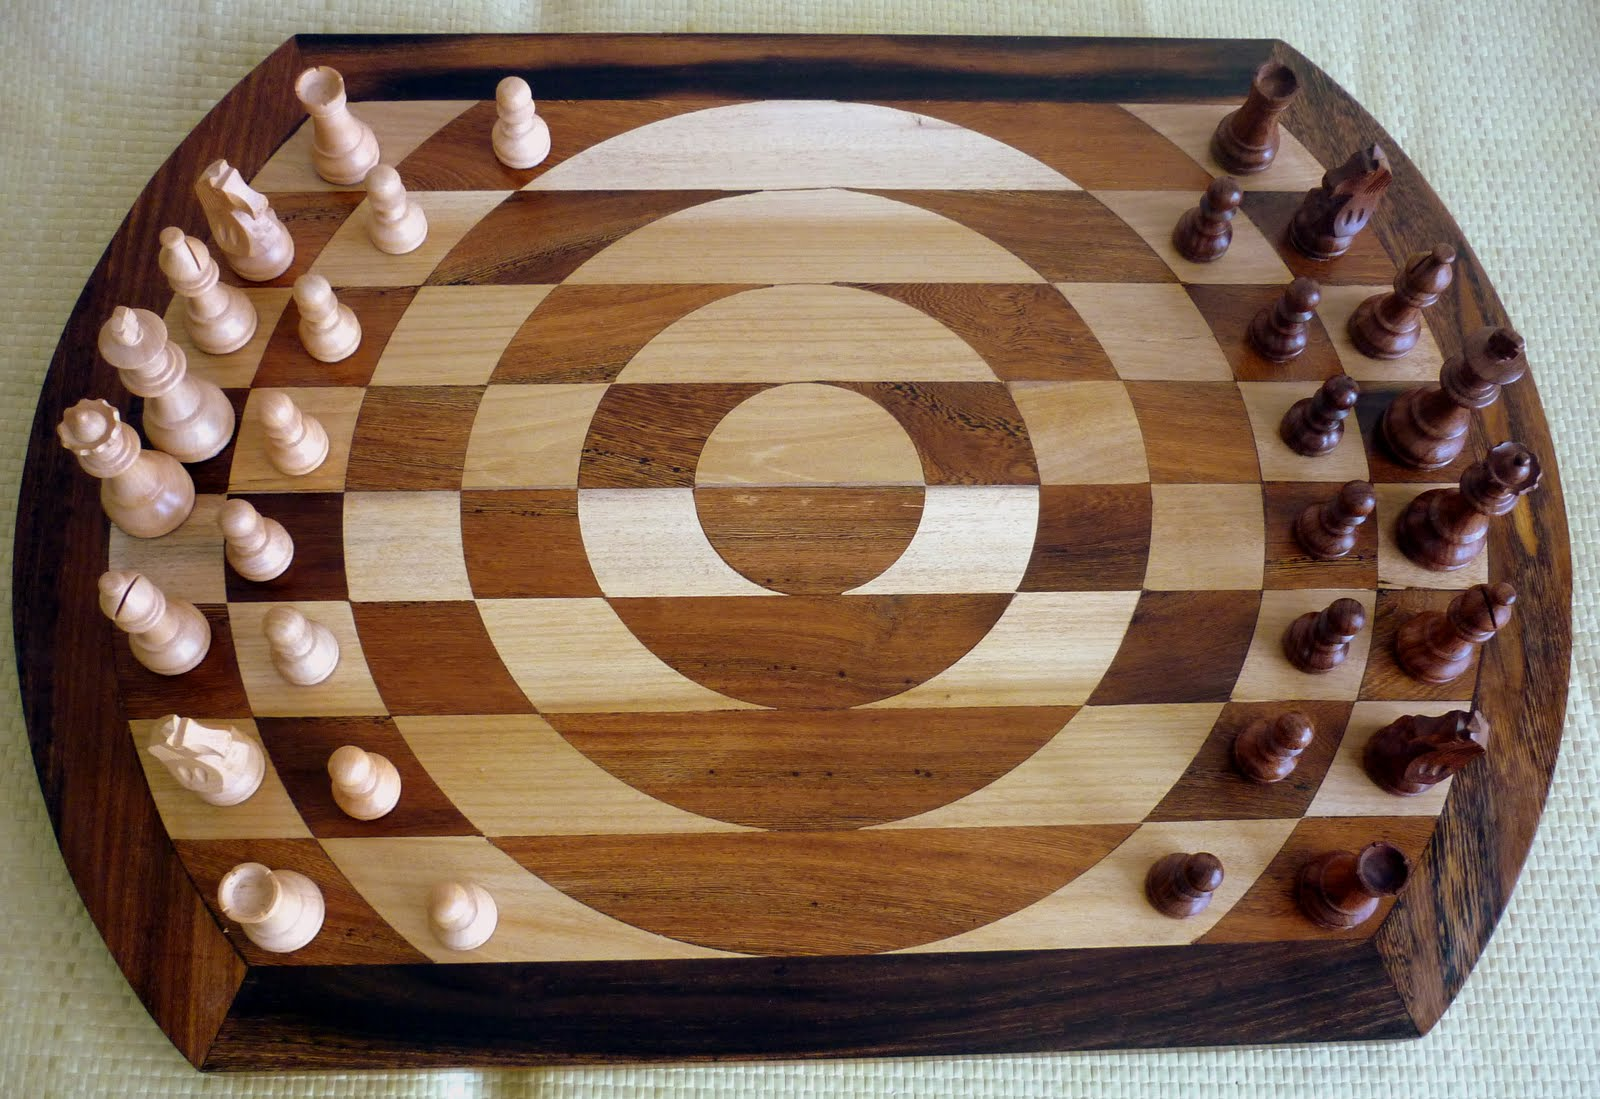 chess board setup diagram toyota wiring harness singularity